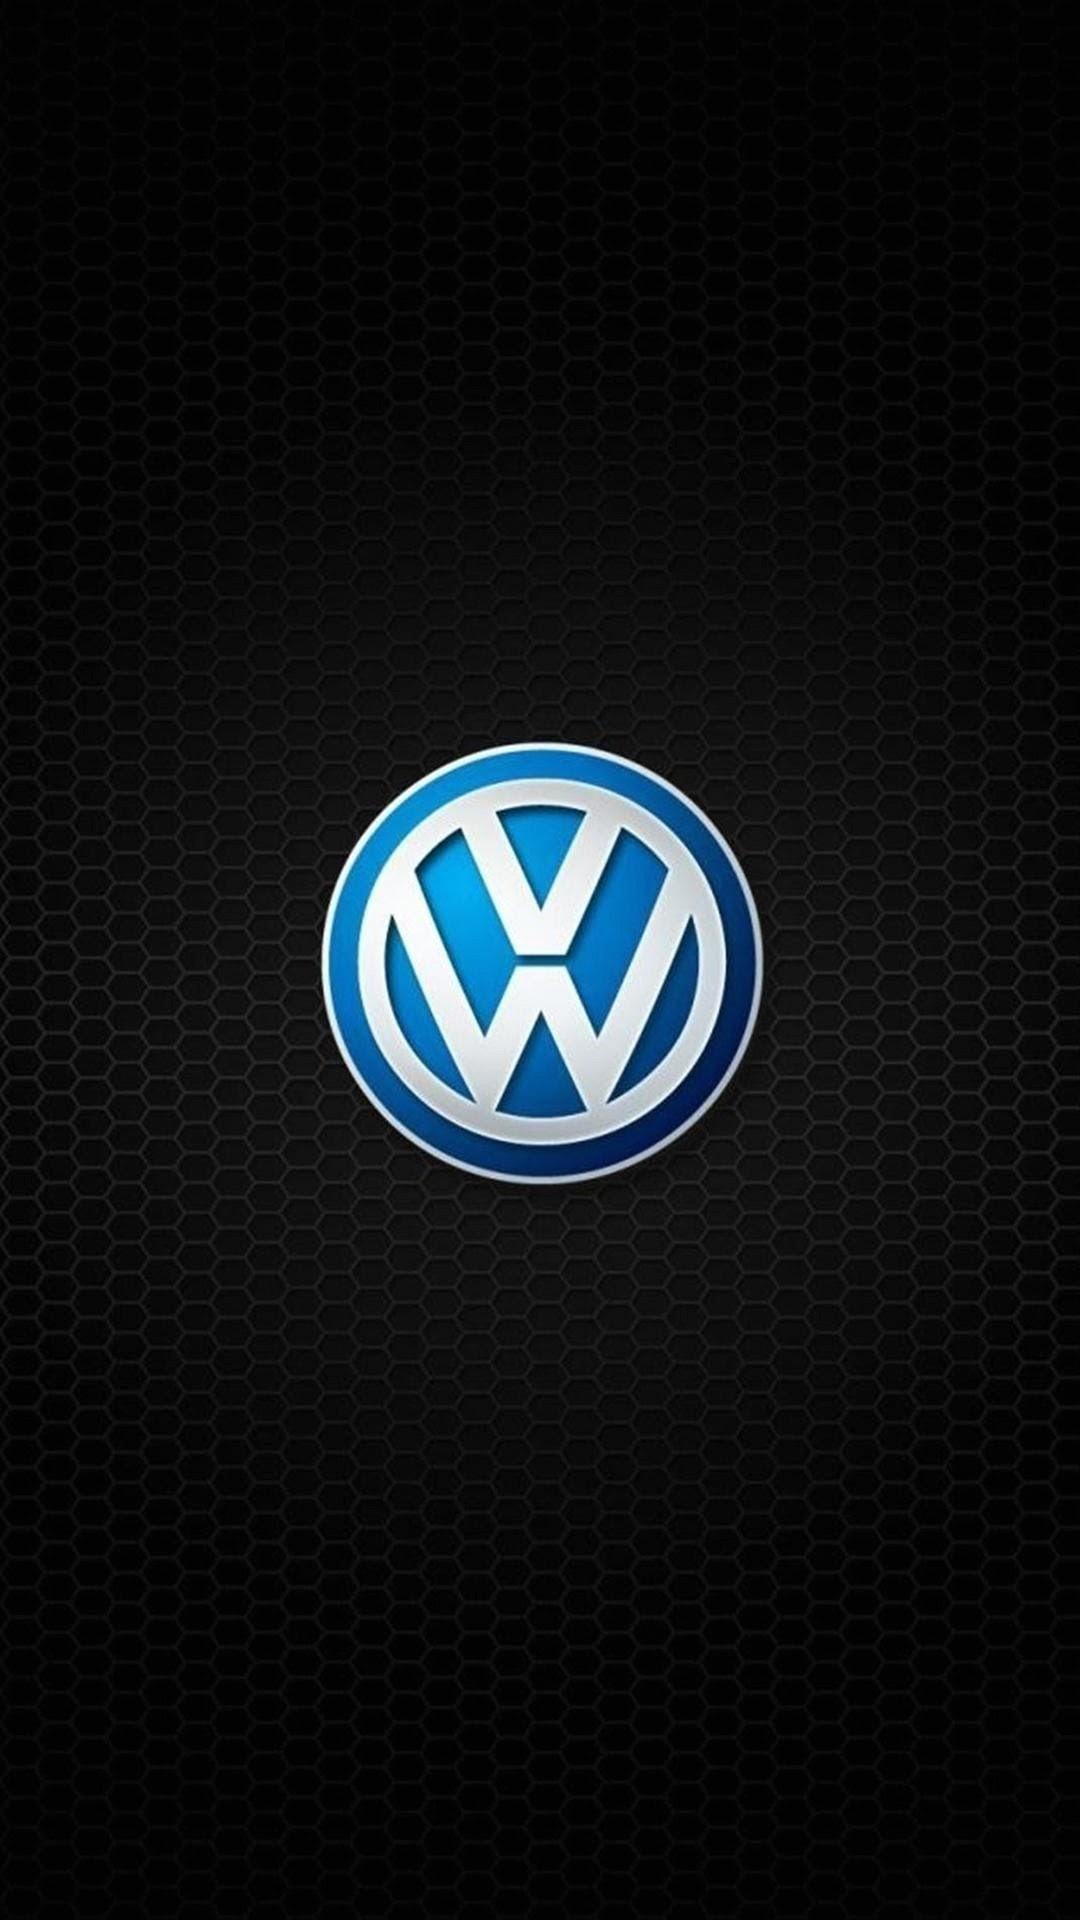 Volk Wagon Volkswagen Logo Wallpaper